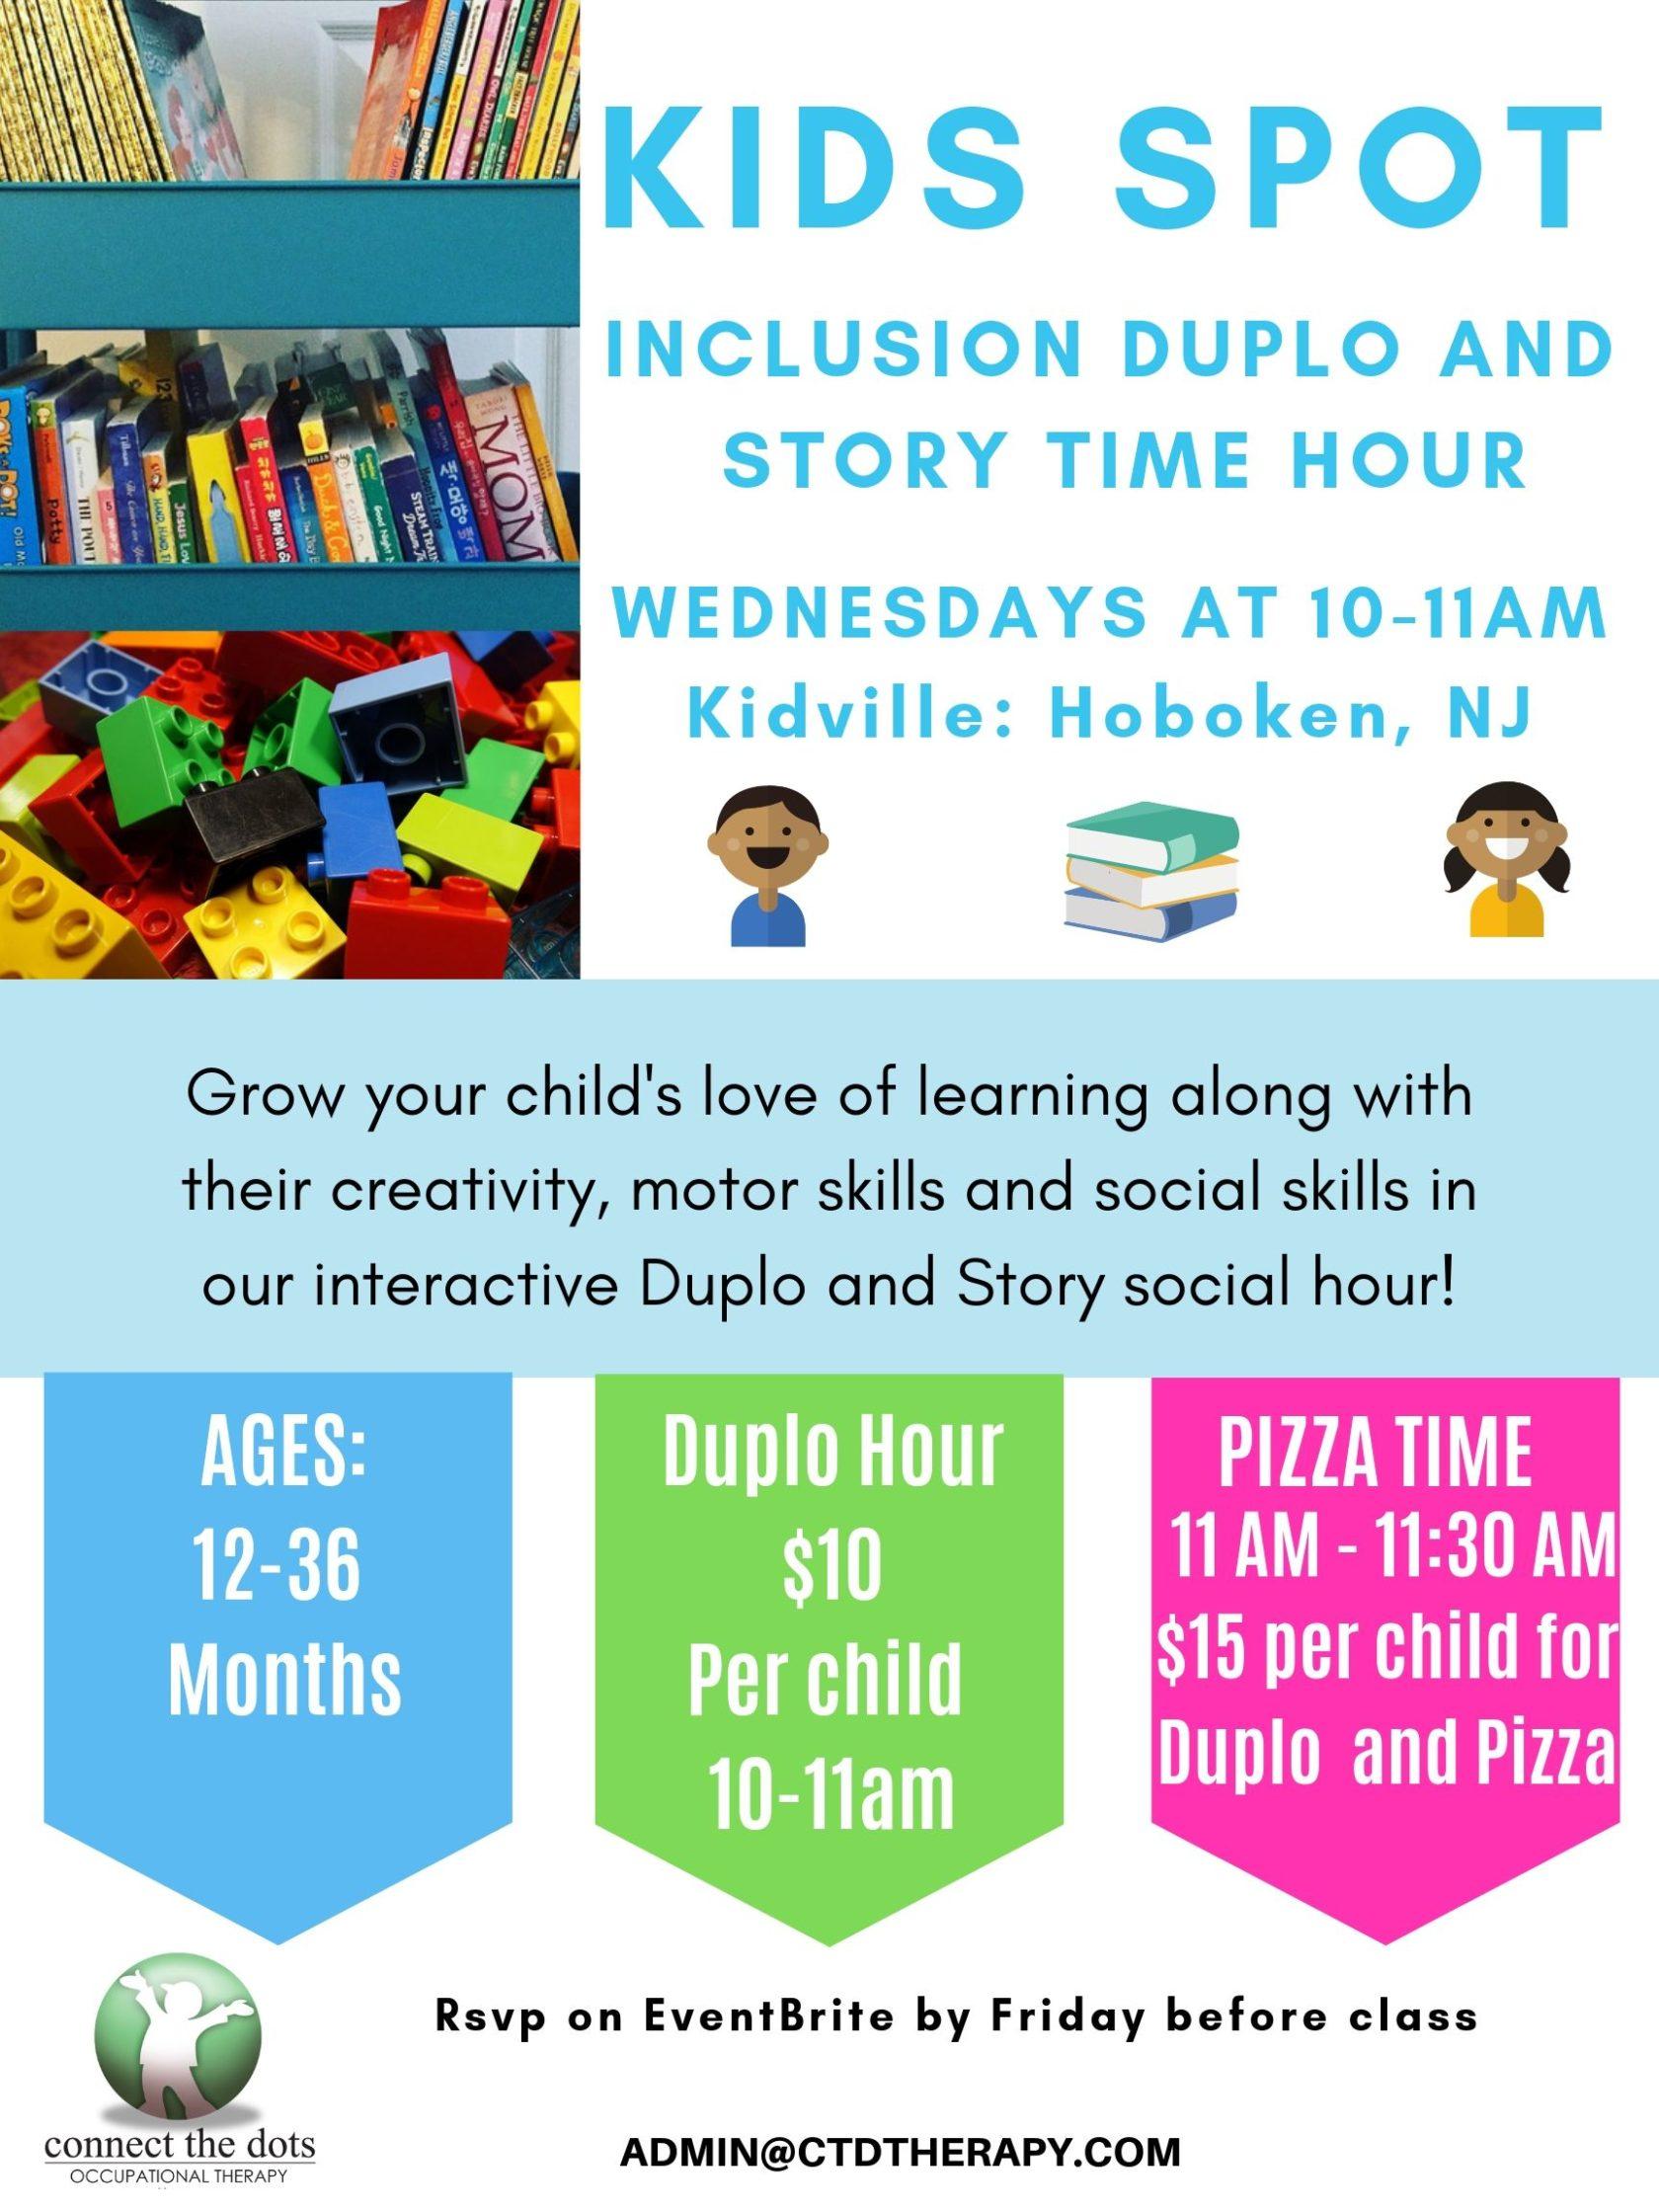 CTD OT Kid'd Spot Inclusion Duplo/Storytime